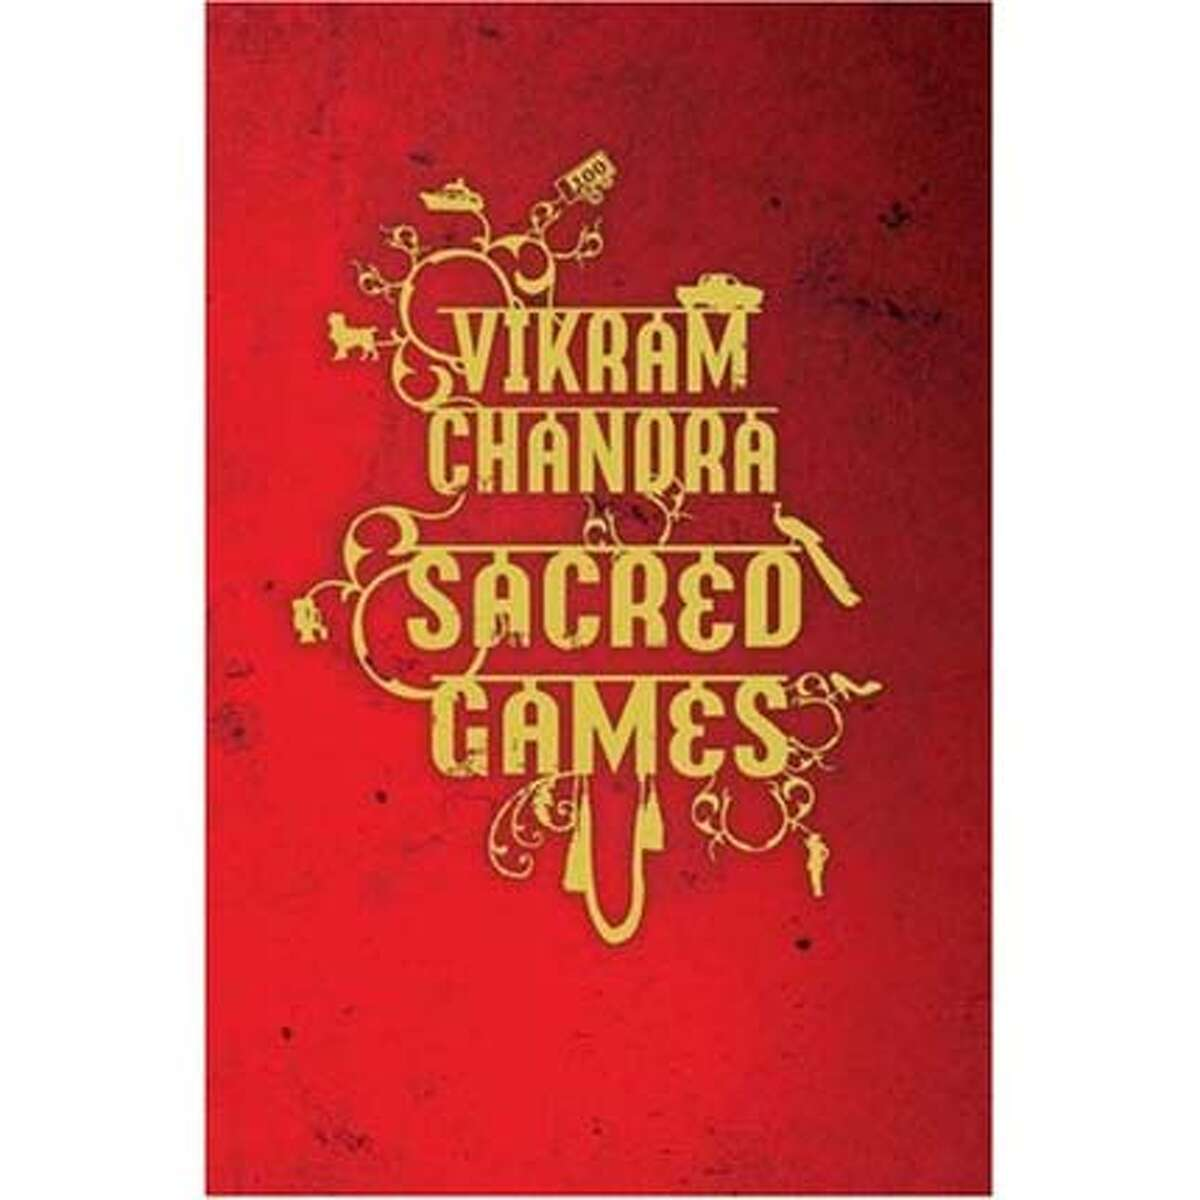 """Sacred Games"" by Vikram Chandra"